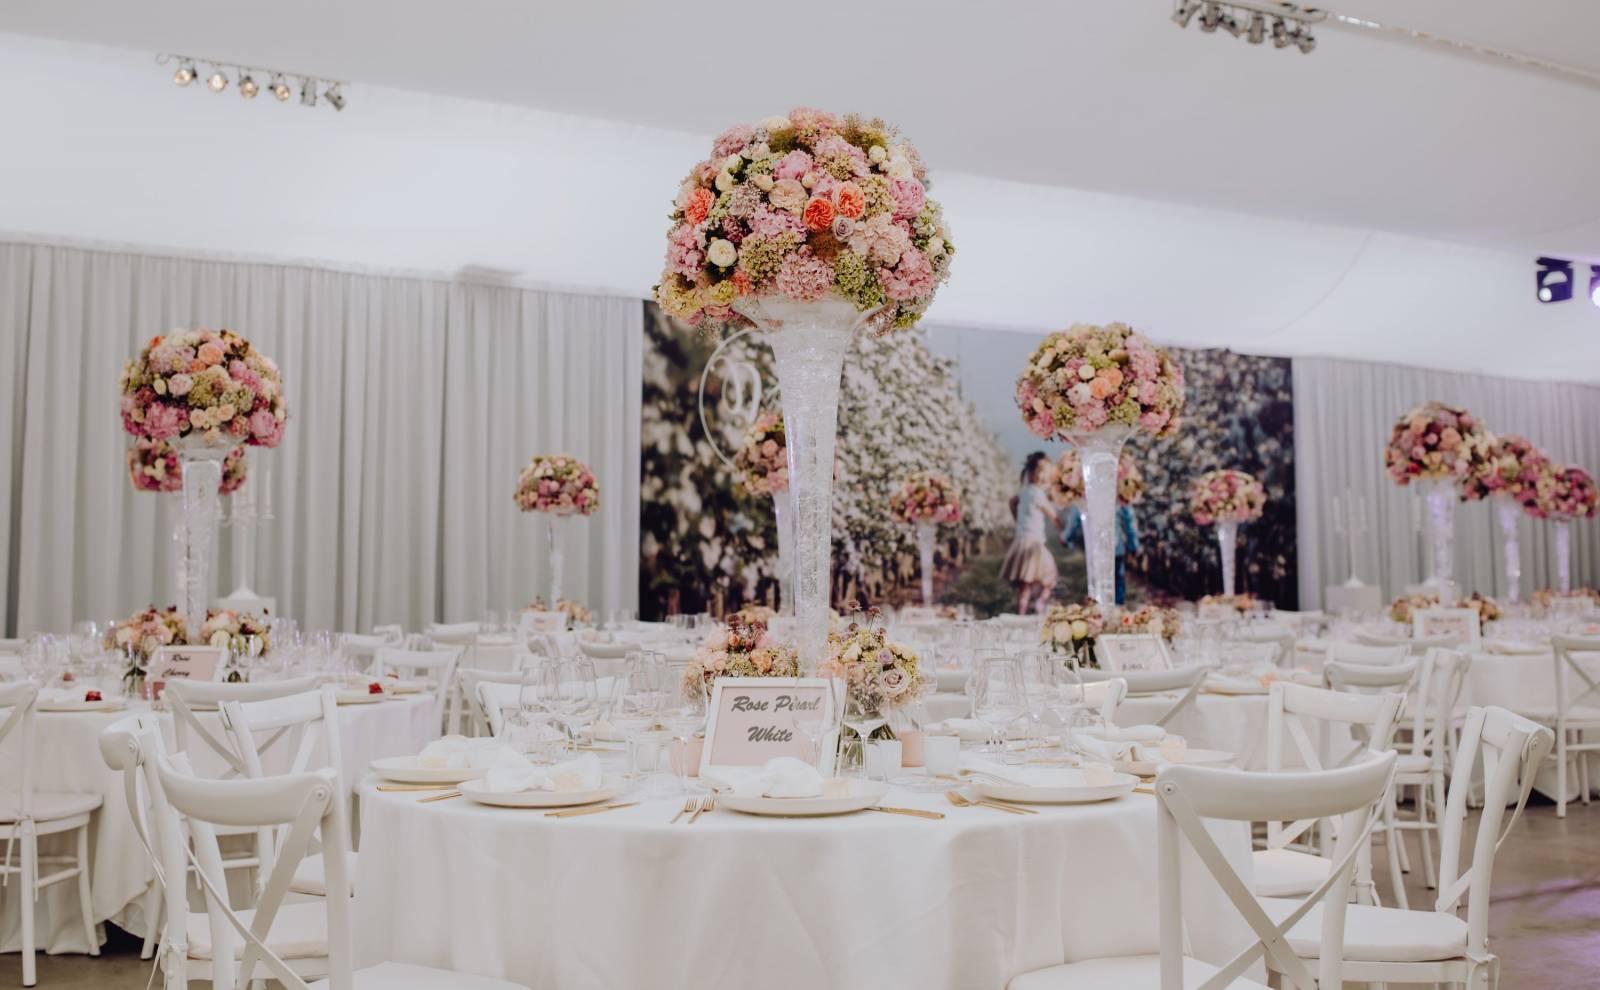 Feriatus - Wedding Planner - Event Planner - House of Weddings - 1